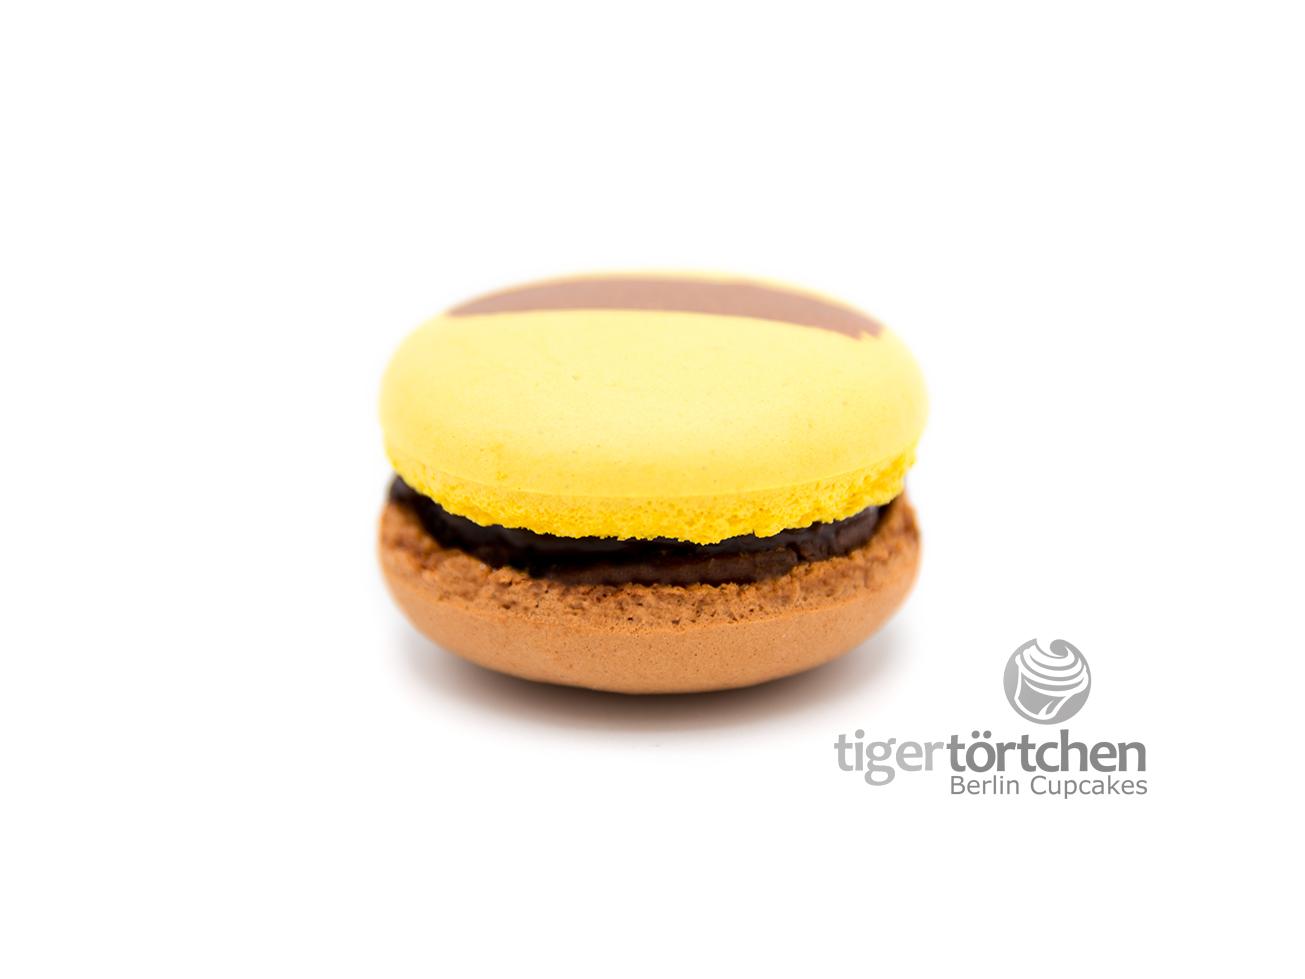 Macaron Whisky tigertörtchen Berlin